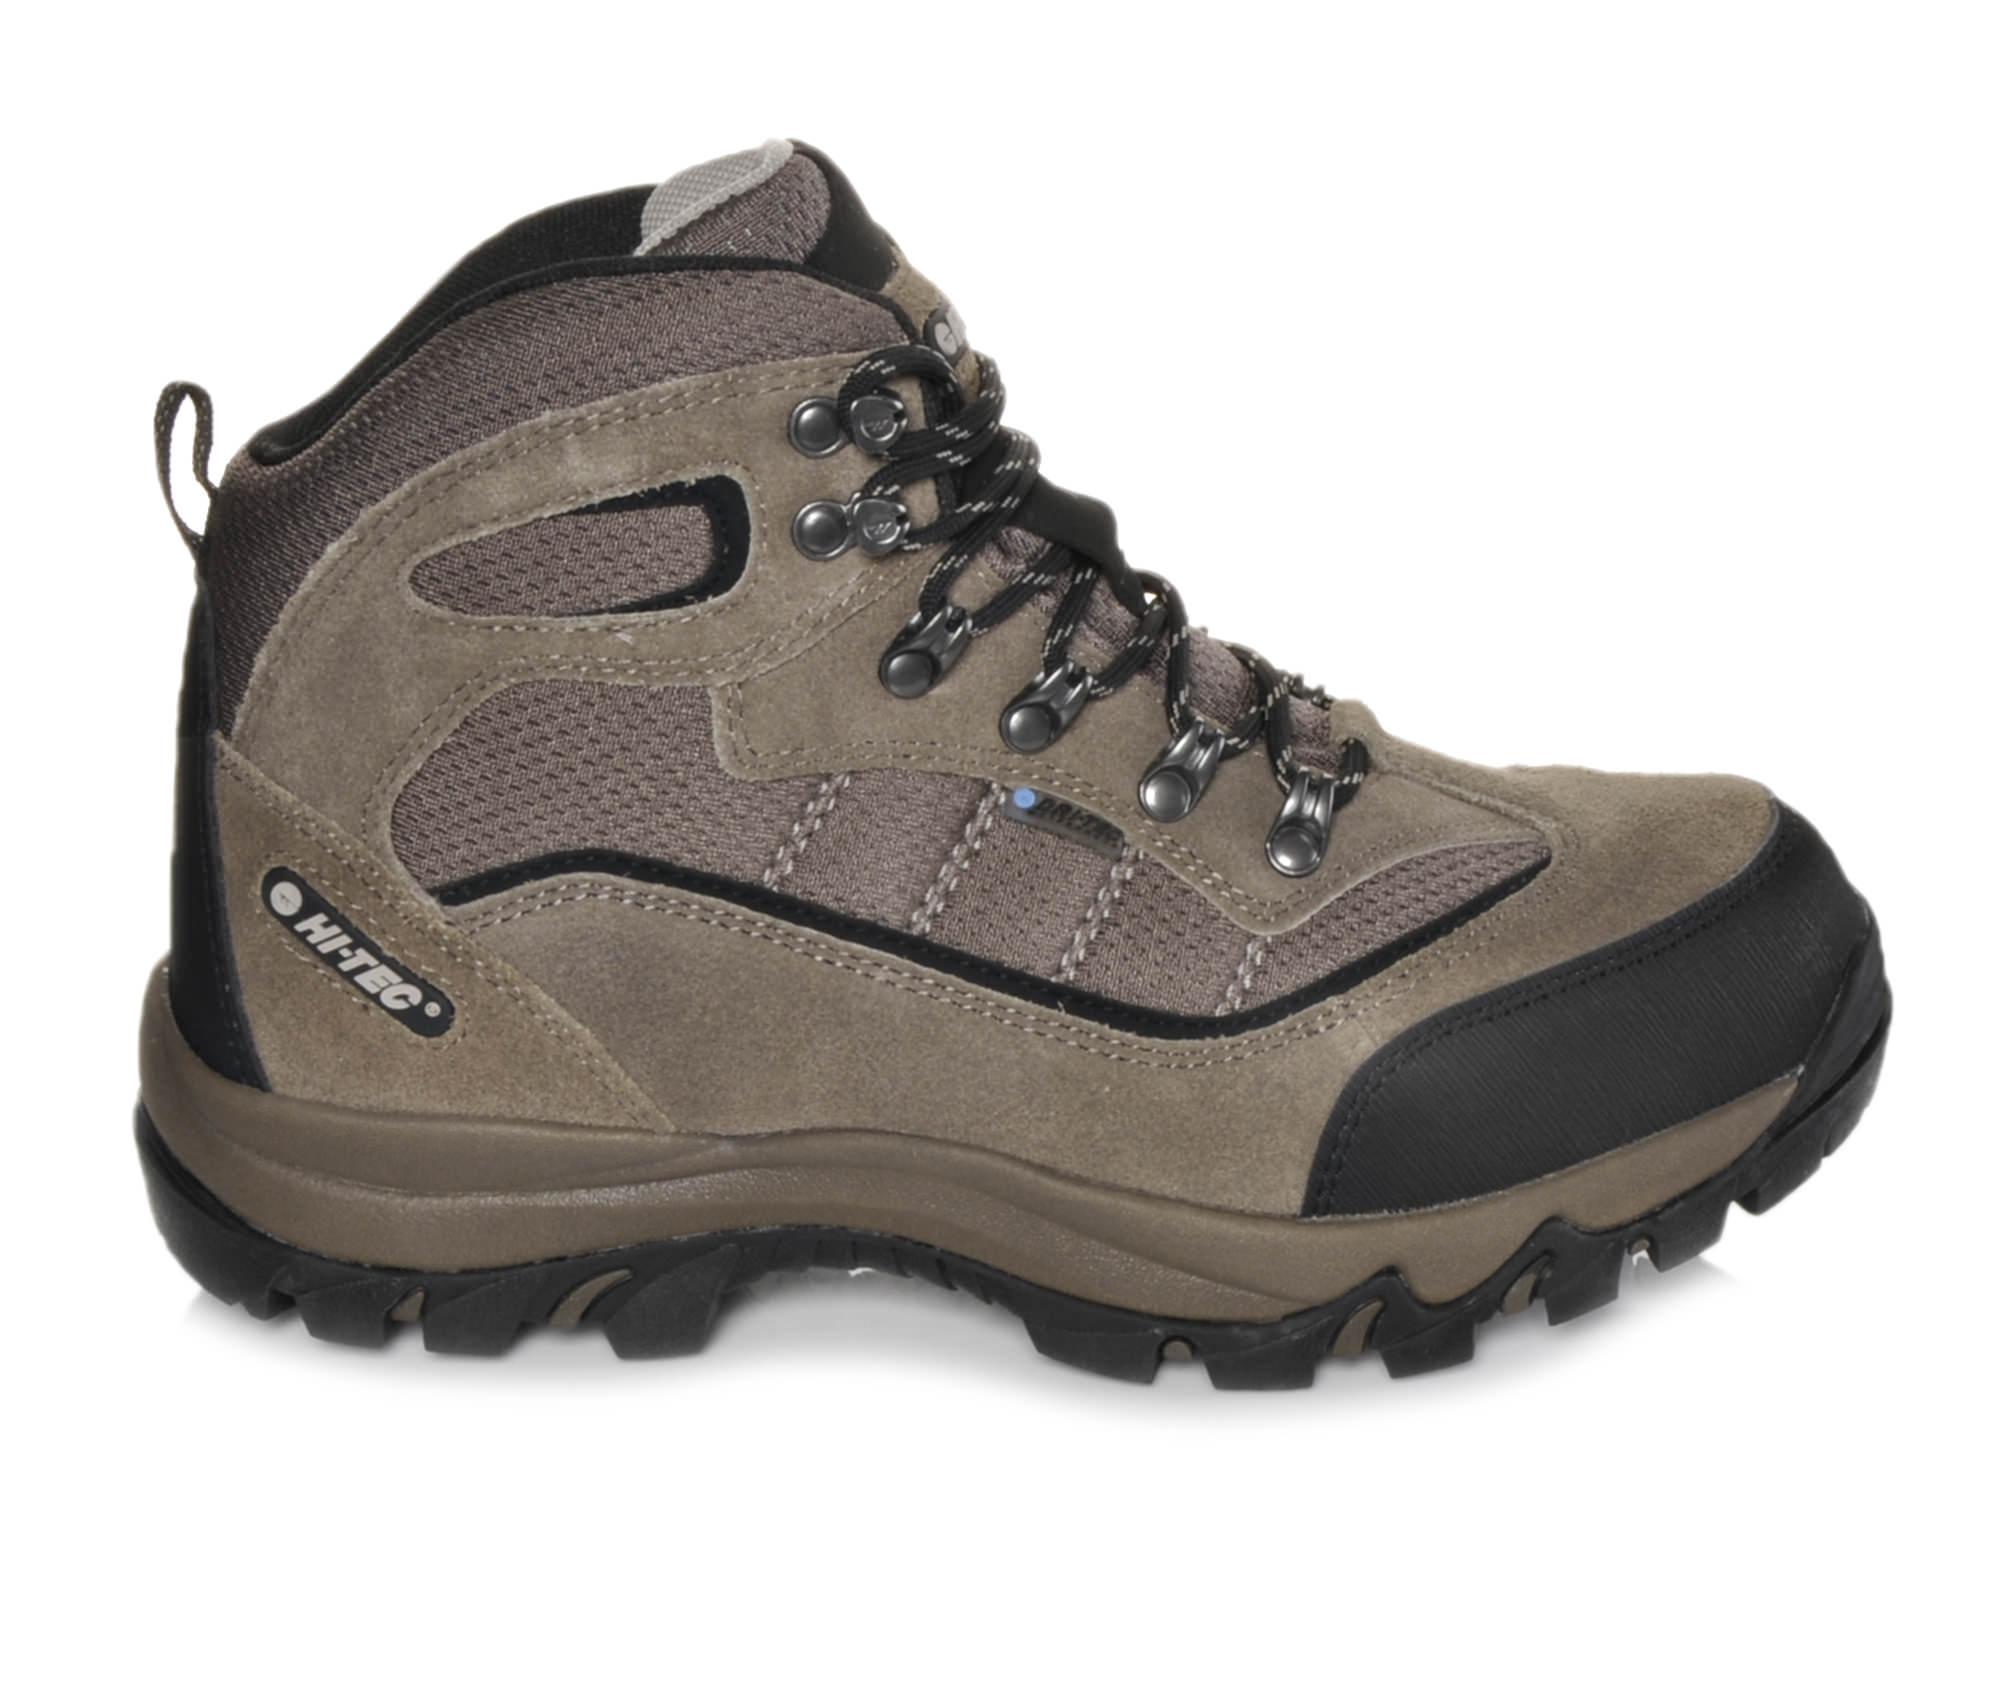 Hi-Tec Skamania Waterproof Men's Boots (Brown Leather)